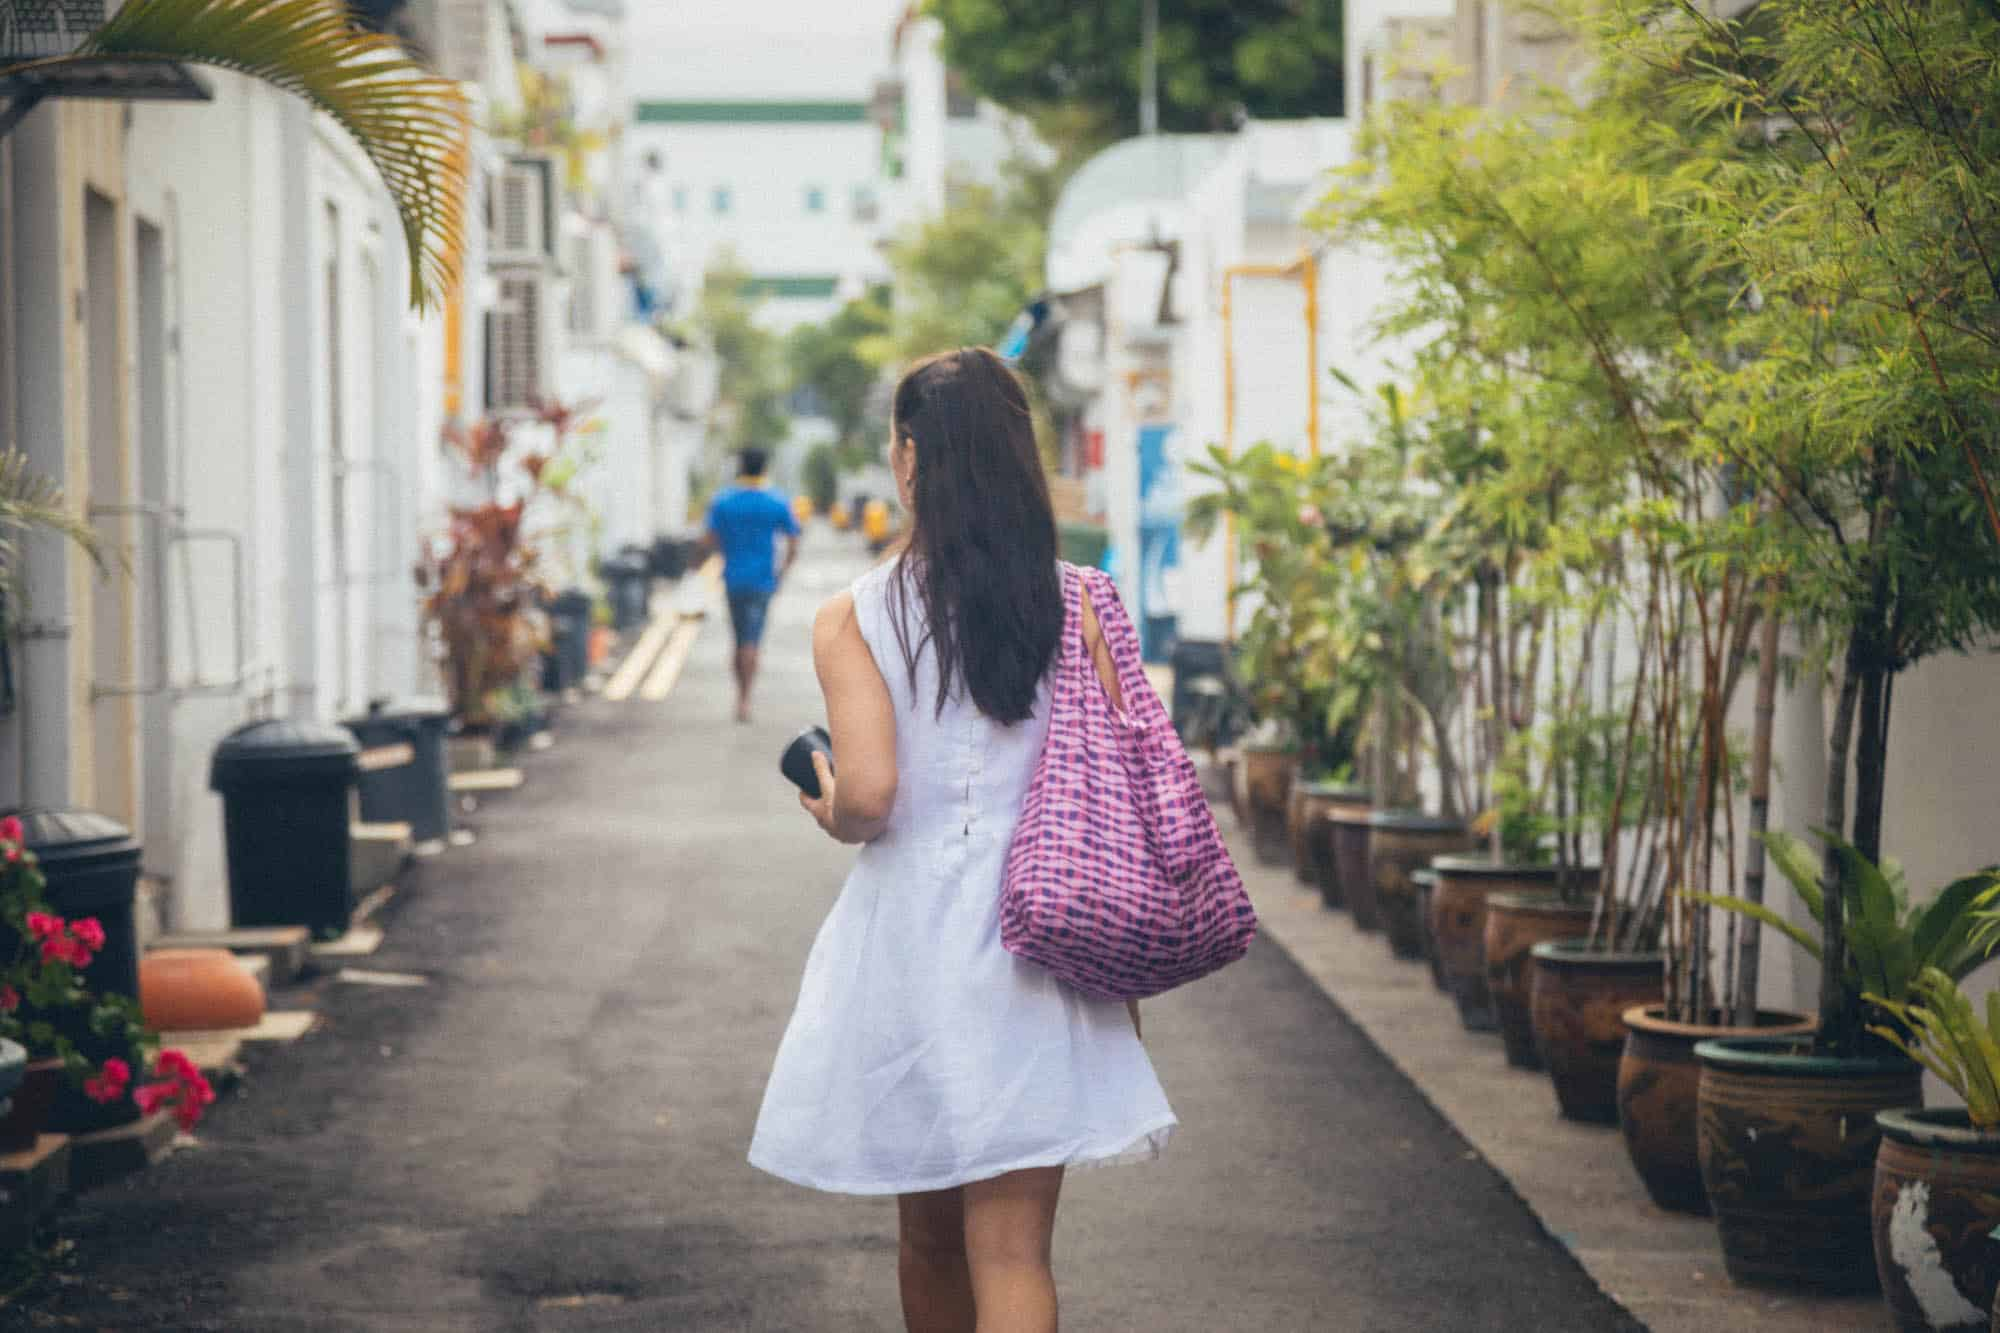 Girl carrying a Peco bag